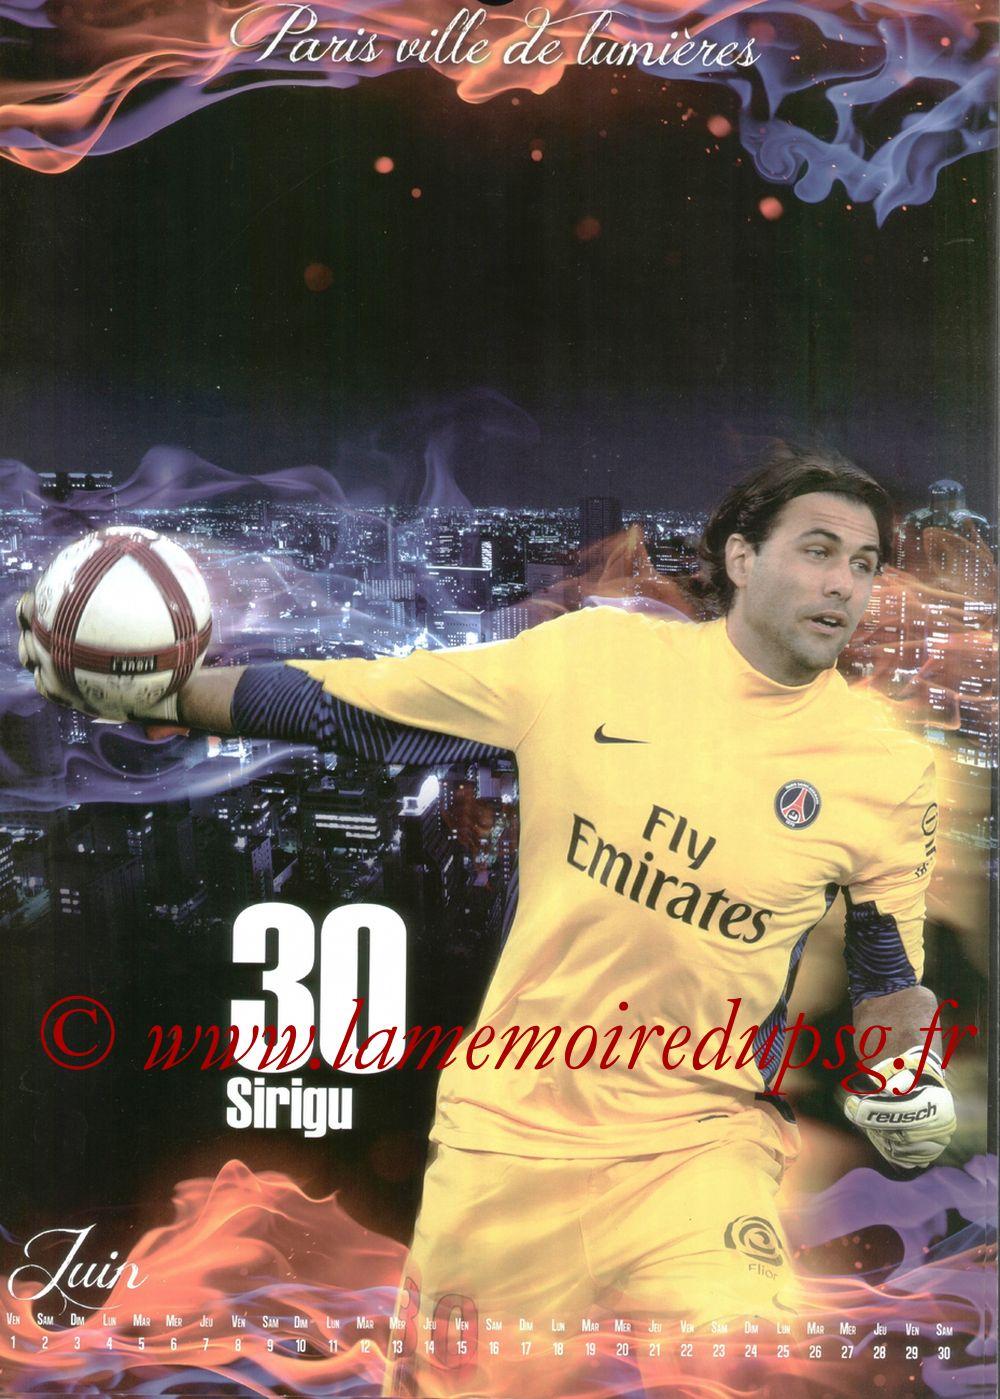 Calendrier PSG 2012bis - Page 06 - Salvatore SIRIGU